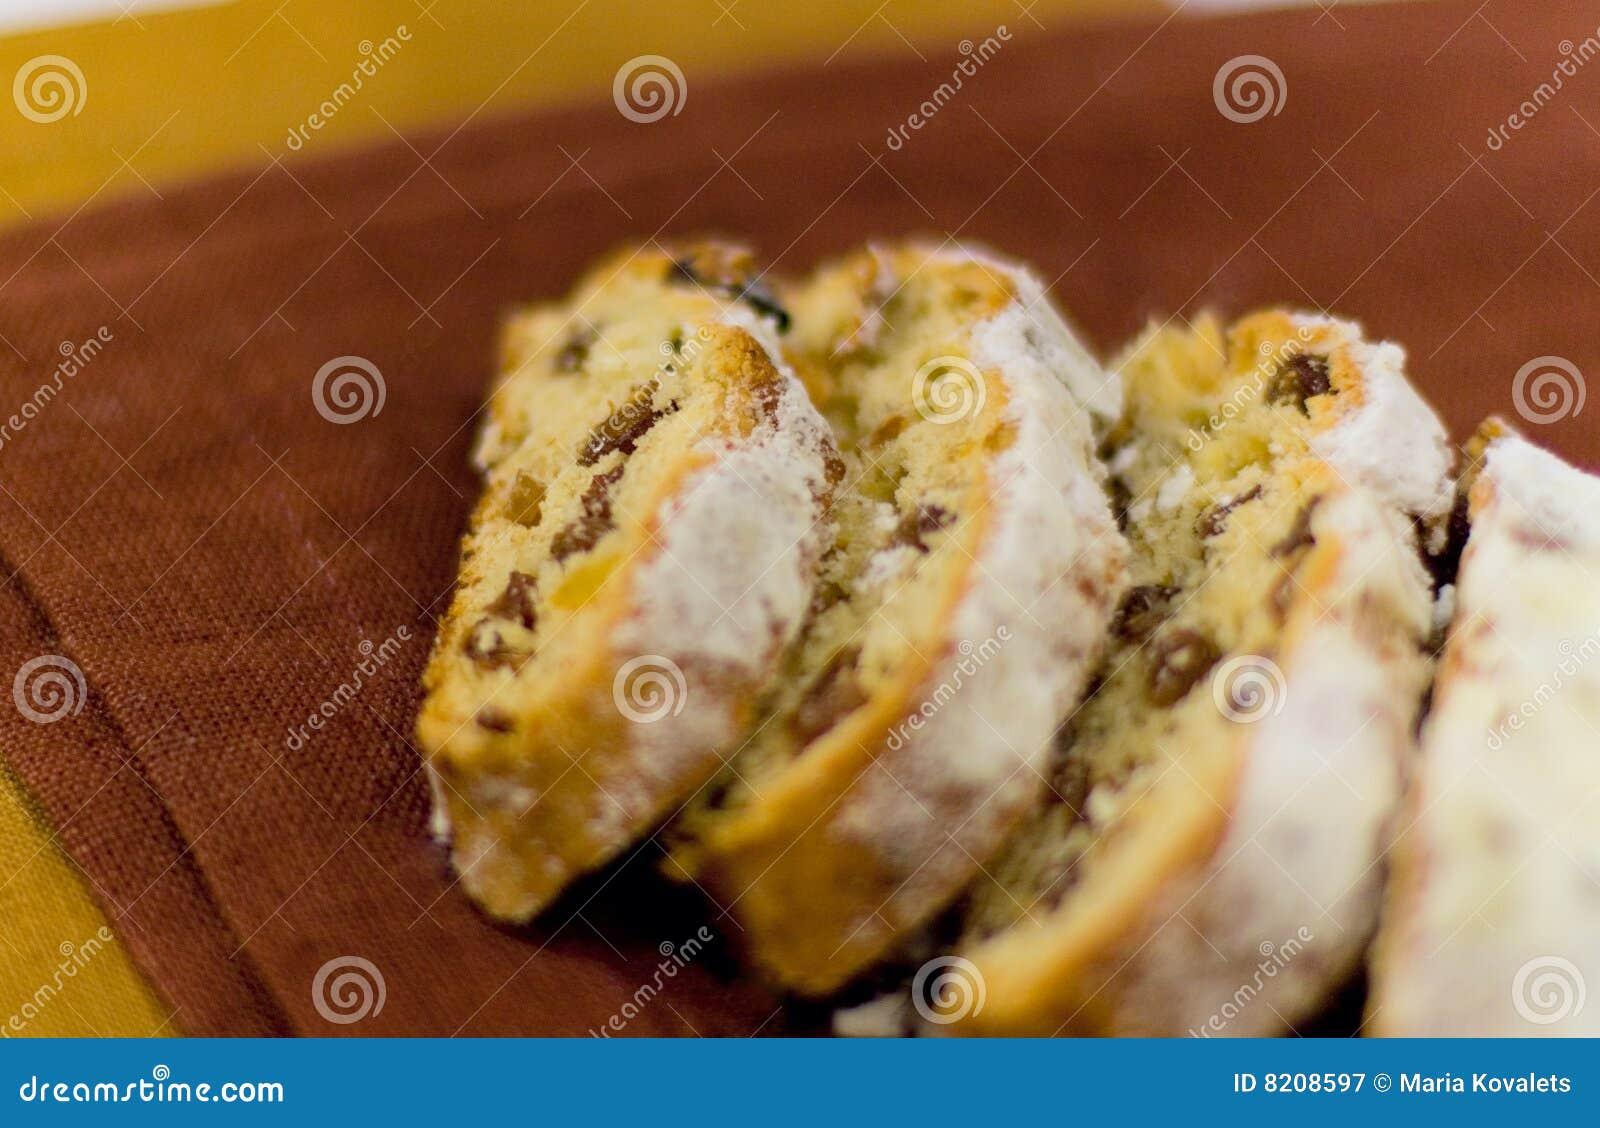 Download Cake stock image. Image of gelatin, gourmet, celebration - 8208597